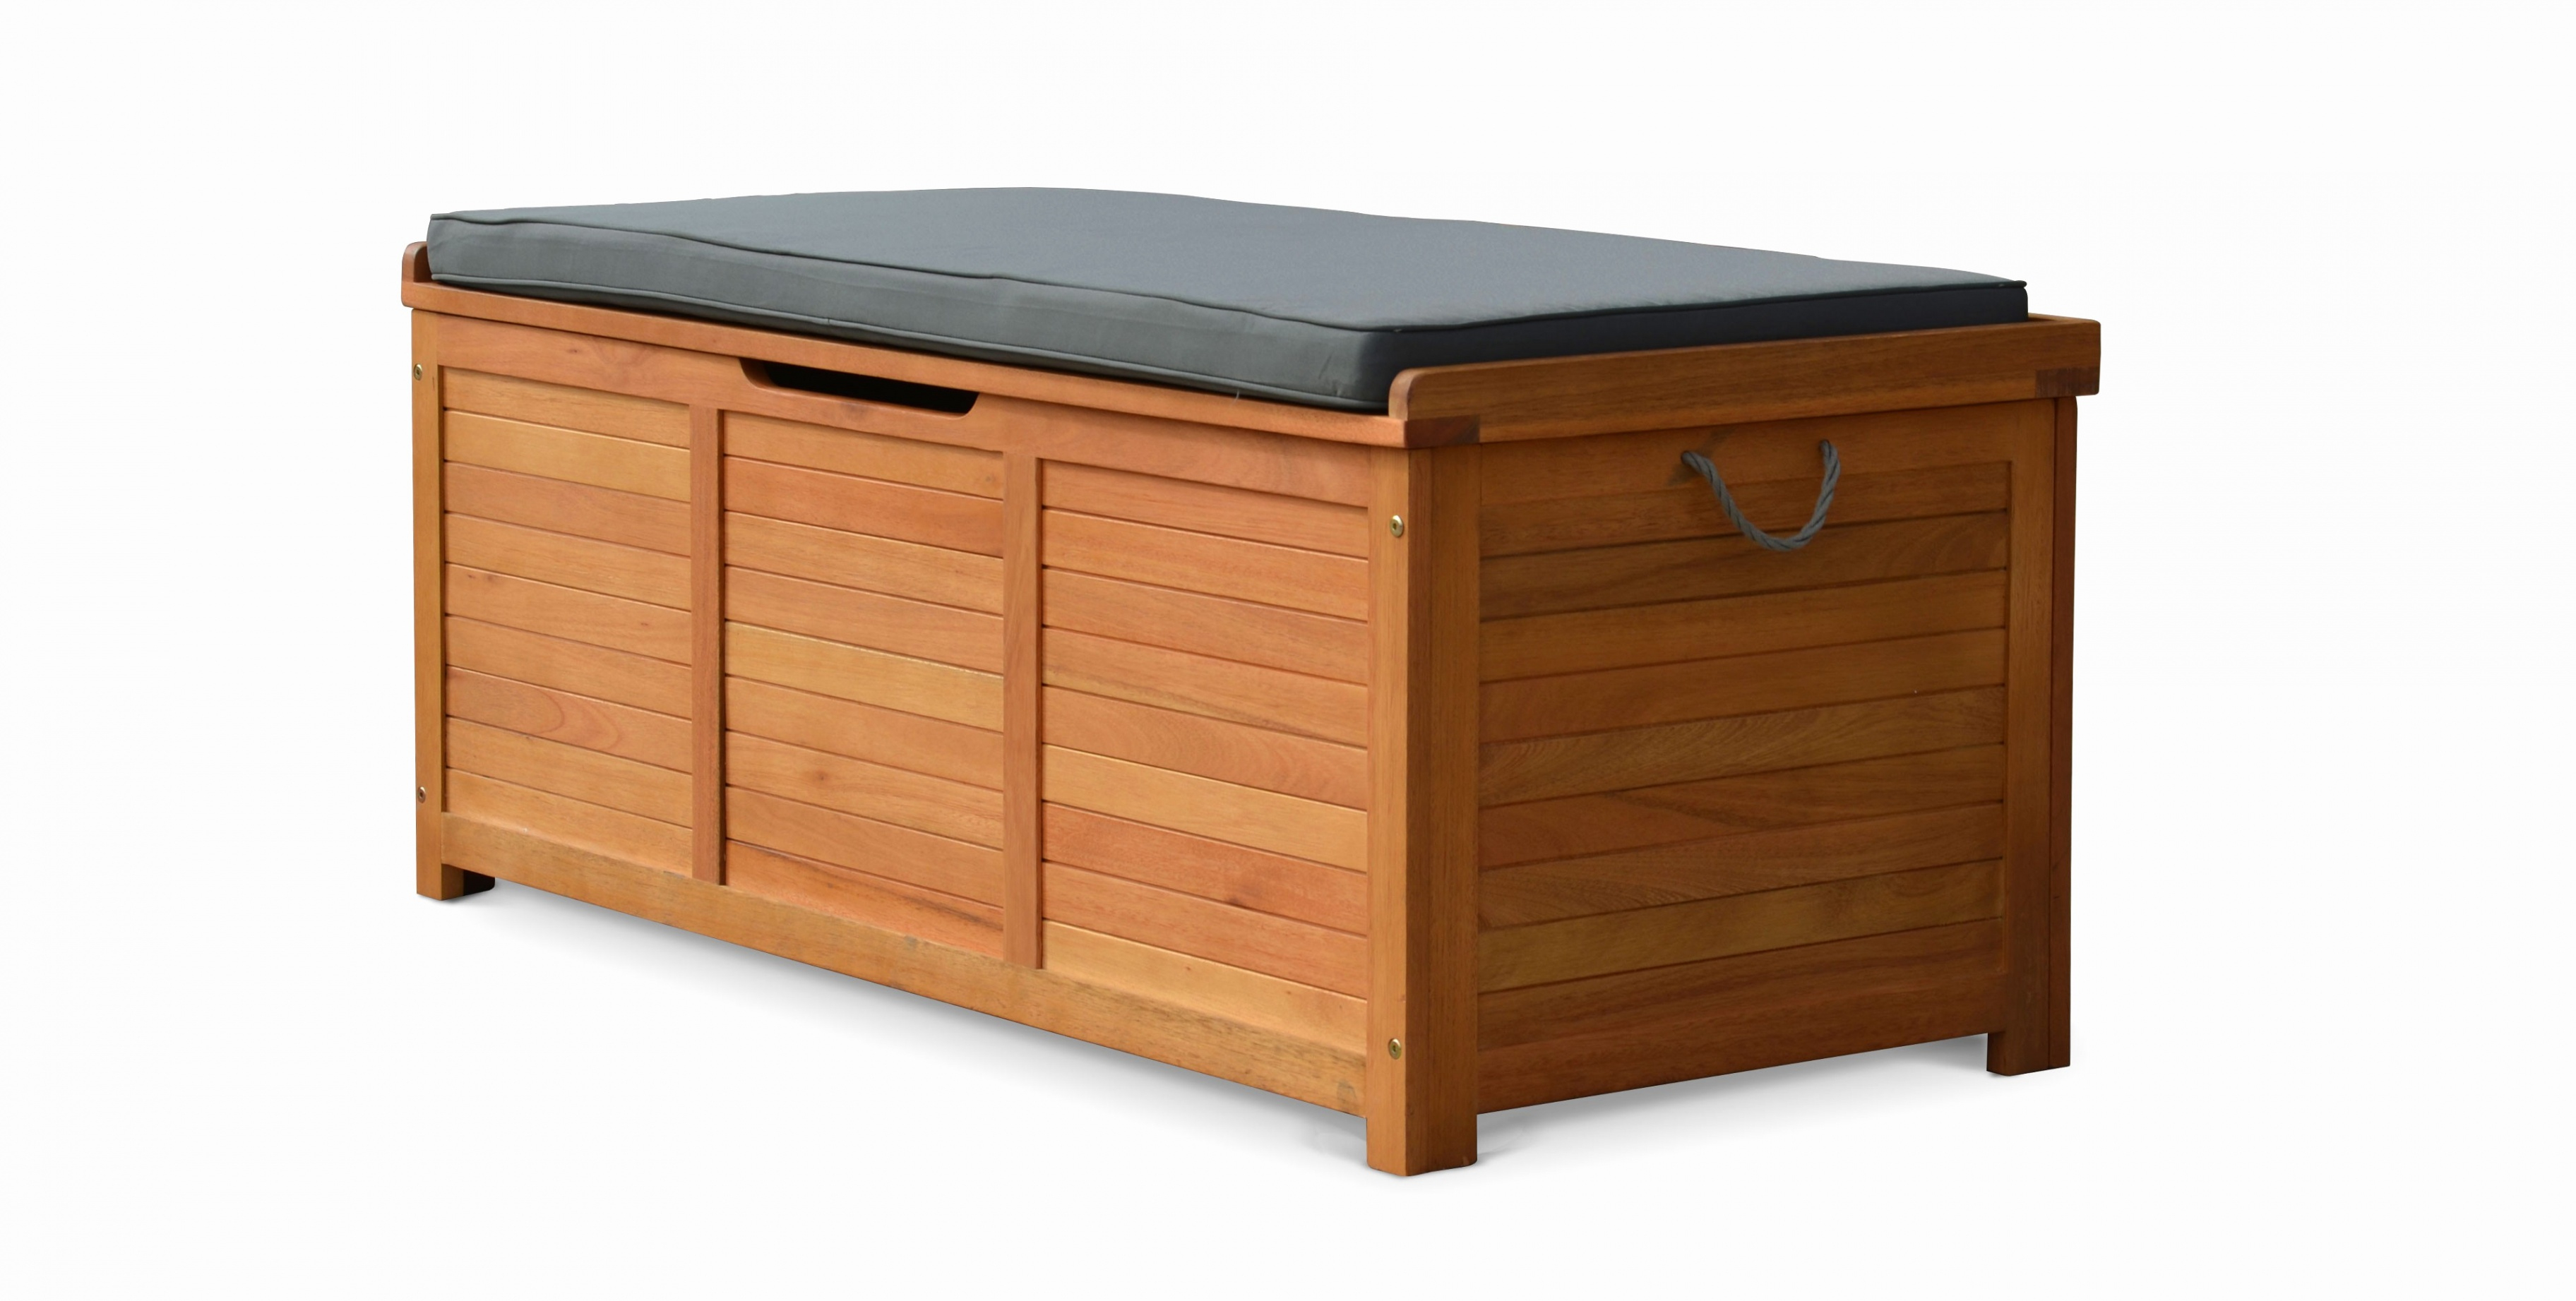 Coffre Rangement Jardin Ikea | Venus Et Judes intérieur Banc De Jardin Ikea